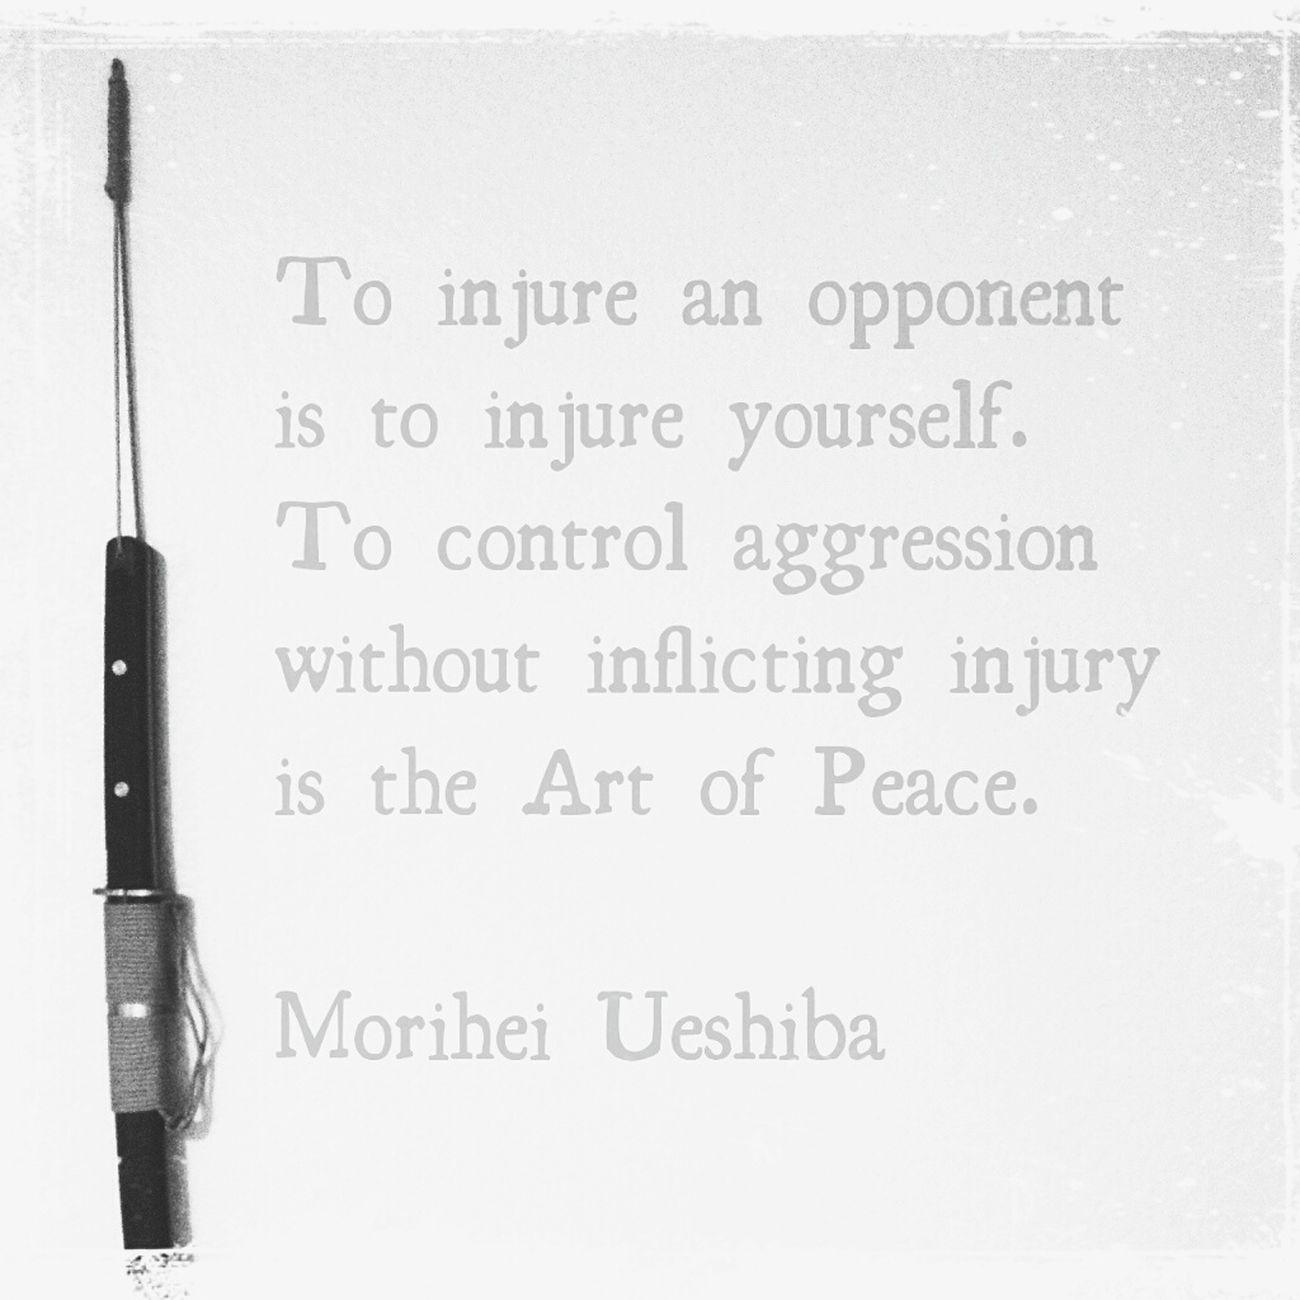 Little something before my Aikido training today... www.aikido.community Aïkido Martialarts Martial Arts Peace Bushido Budo Japanese  Japan Martialart Quote